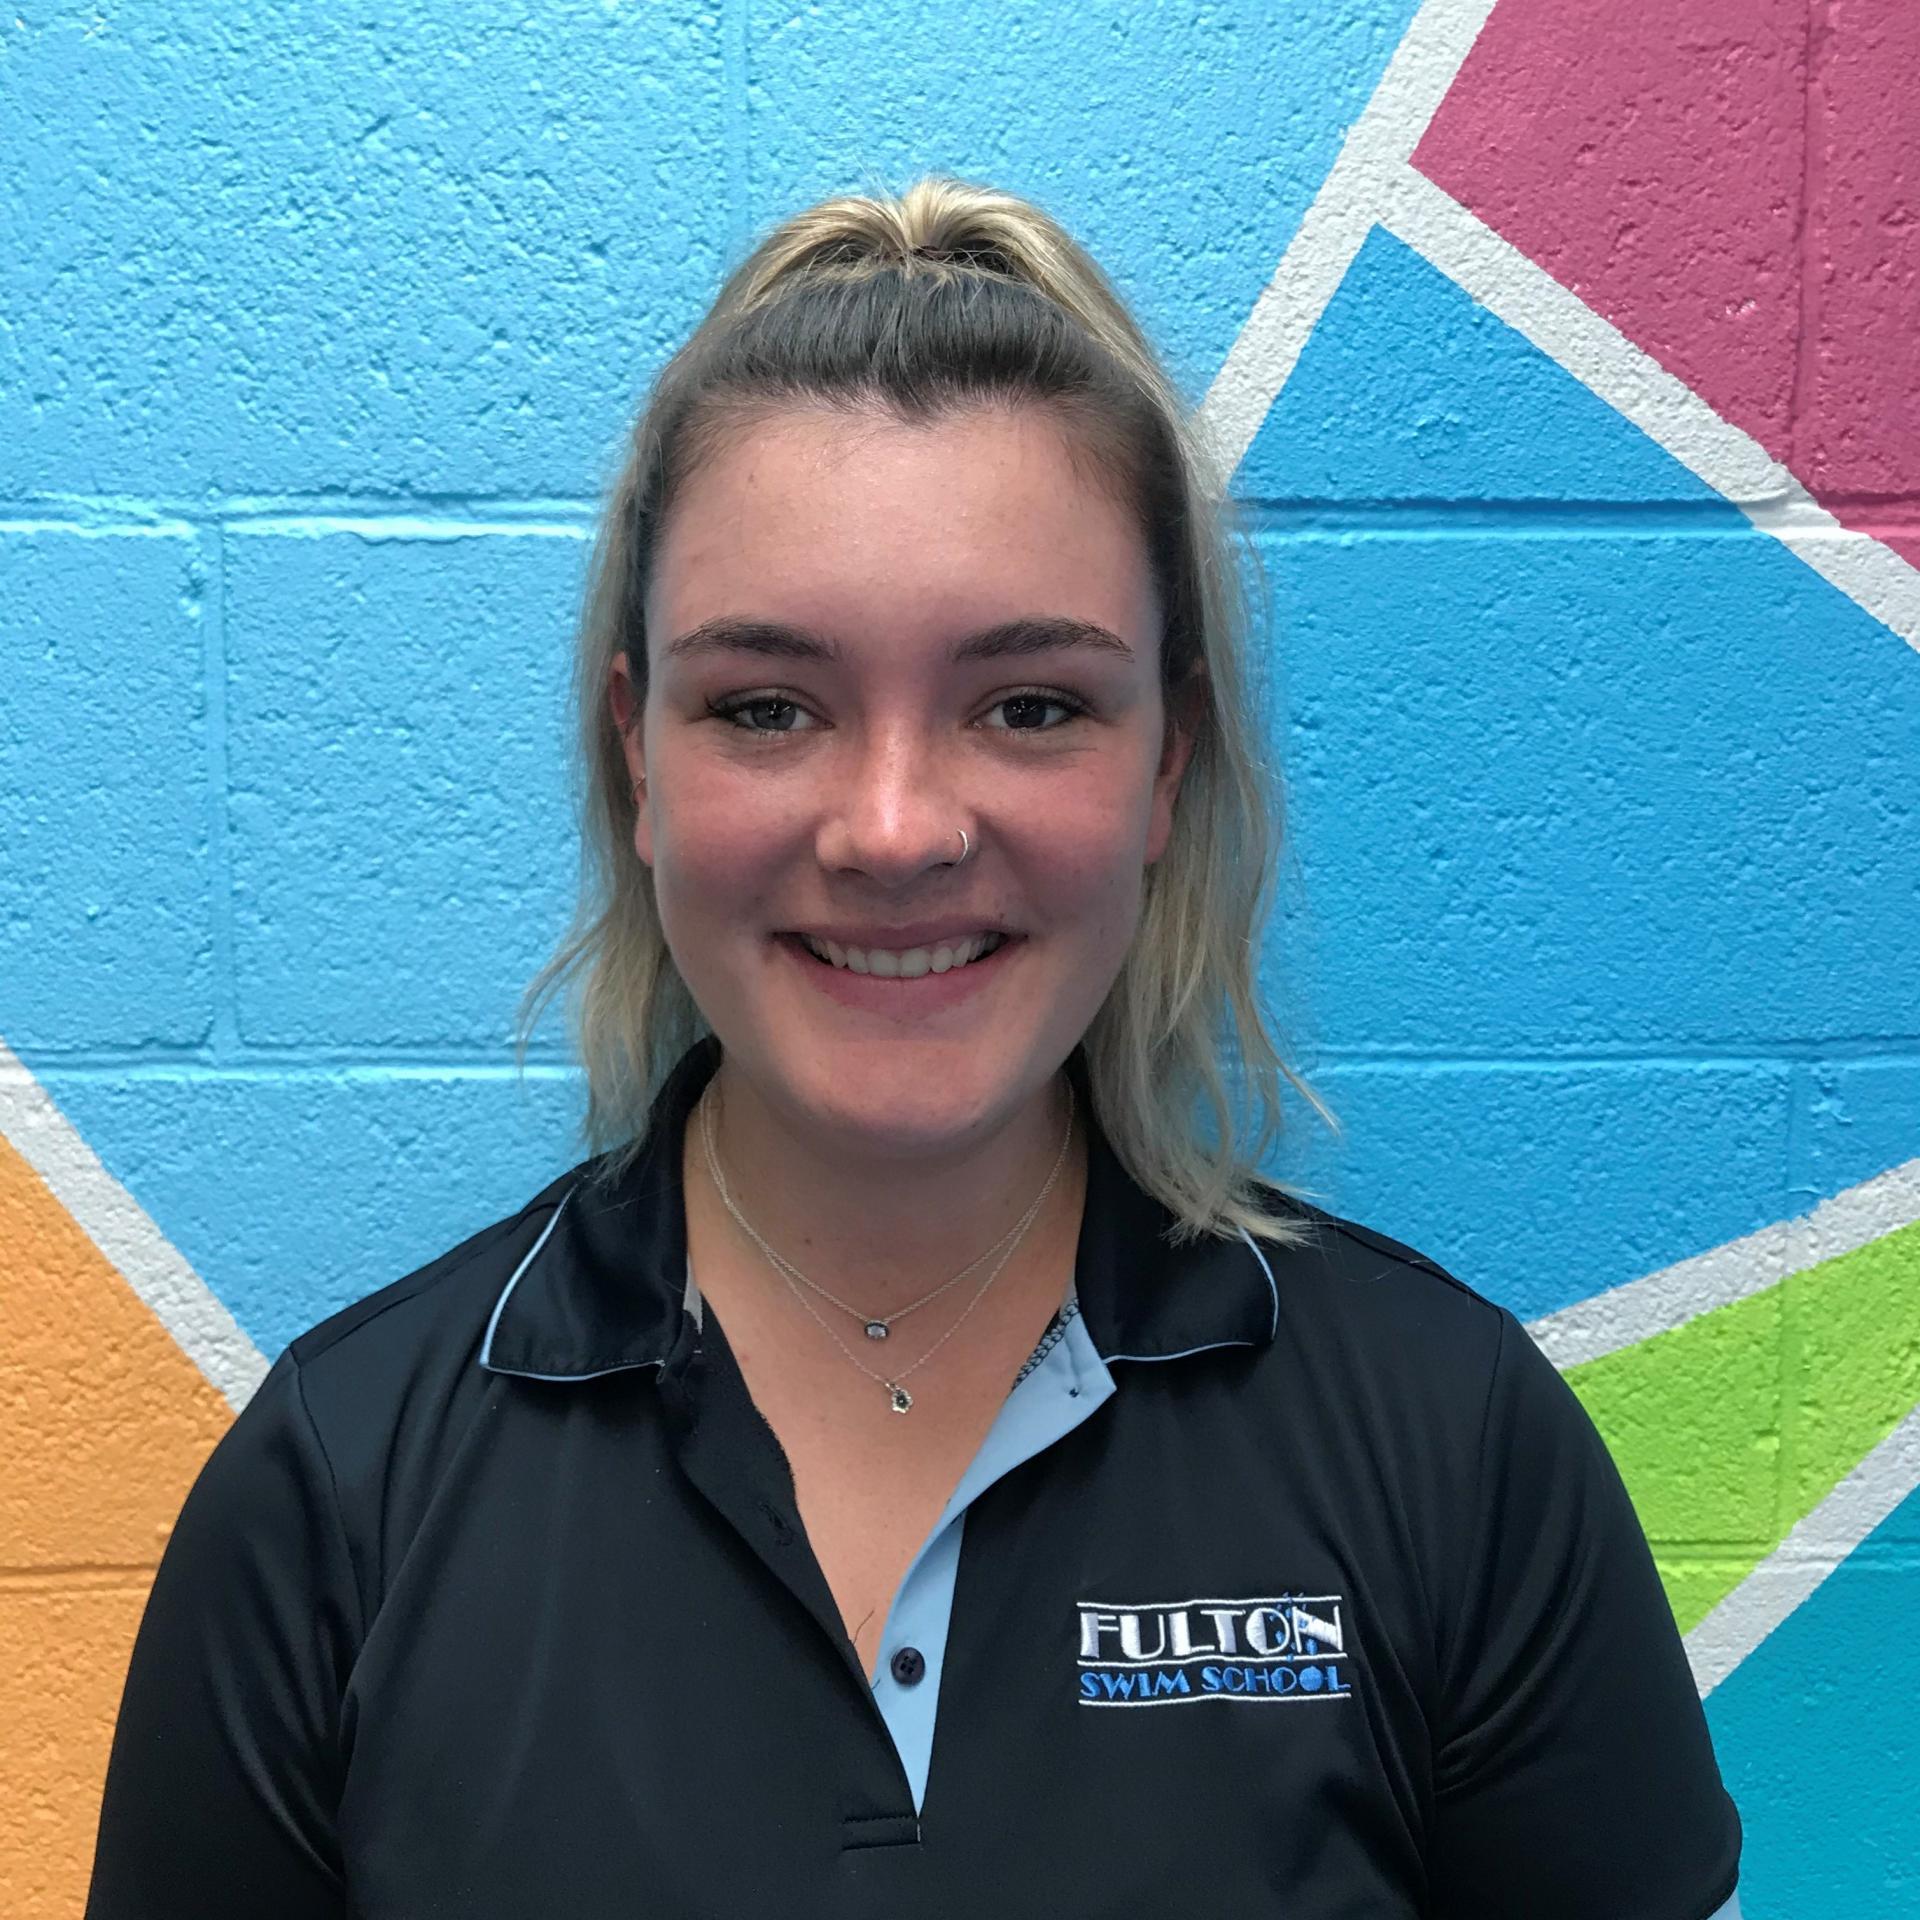 Tamsyn - Fulton Swim School Teacher